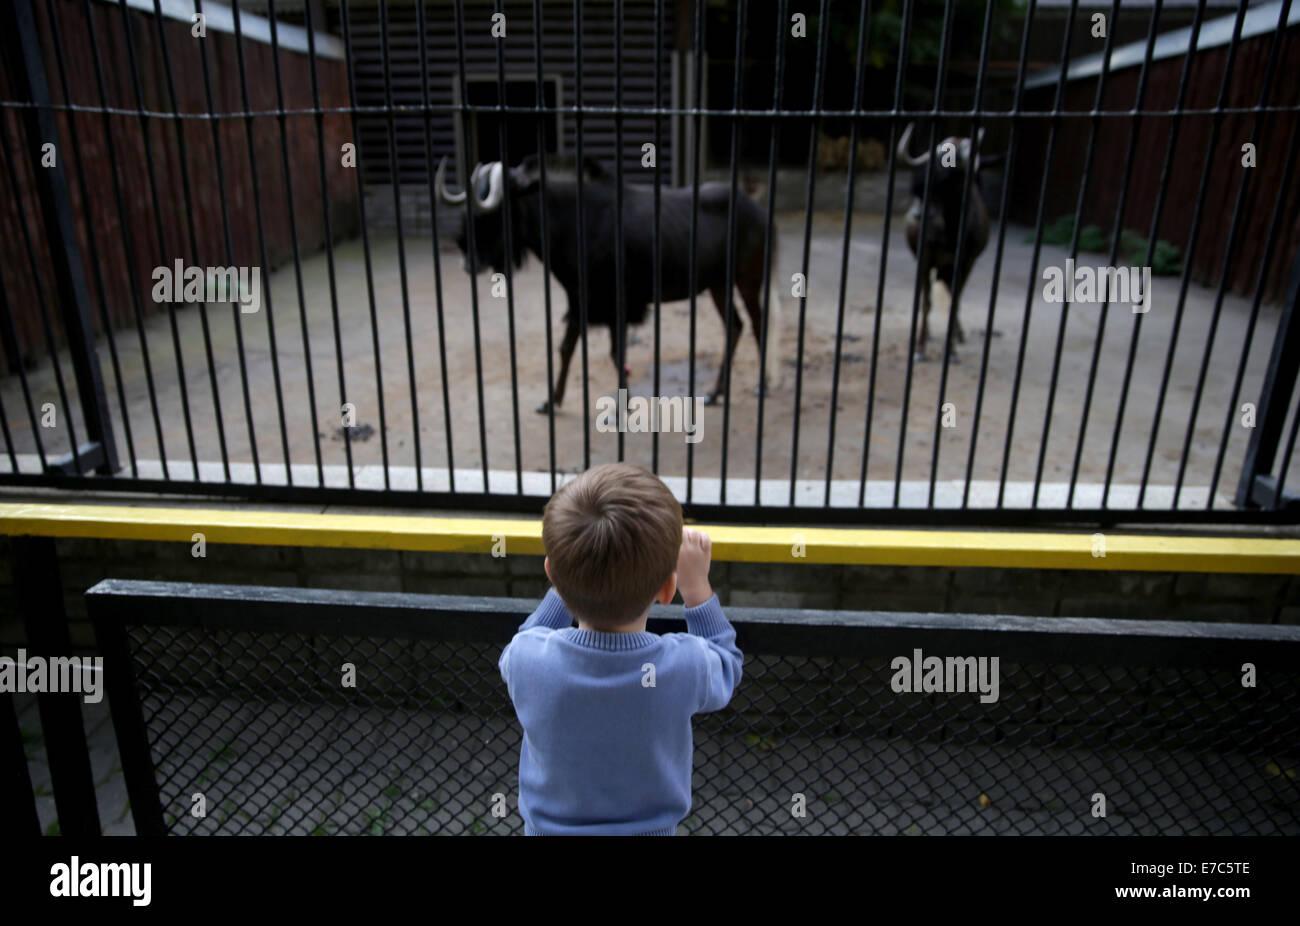 Moscow, Russia. 11th Sep, 2014. Achild at the Moscow Zoo. © Stanislav Krasilnikov/ITAR-TASS/Alamy Live News - Stock Image